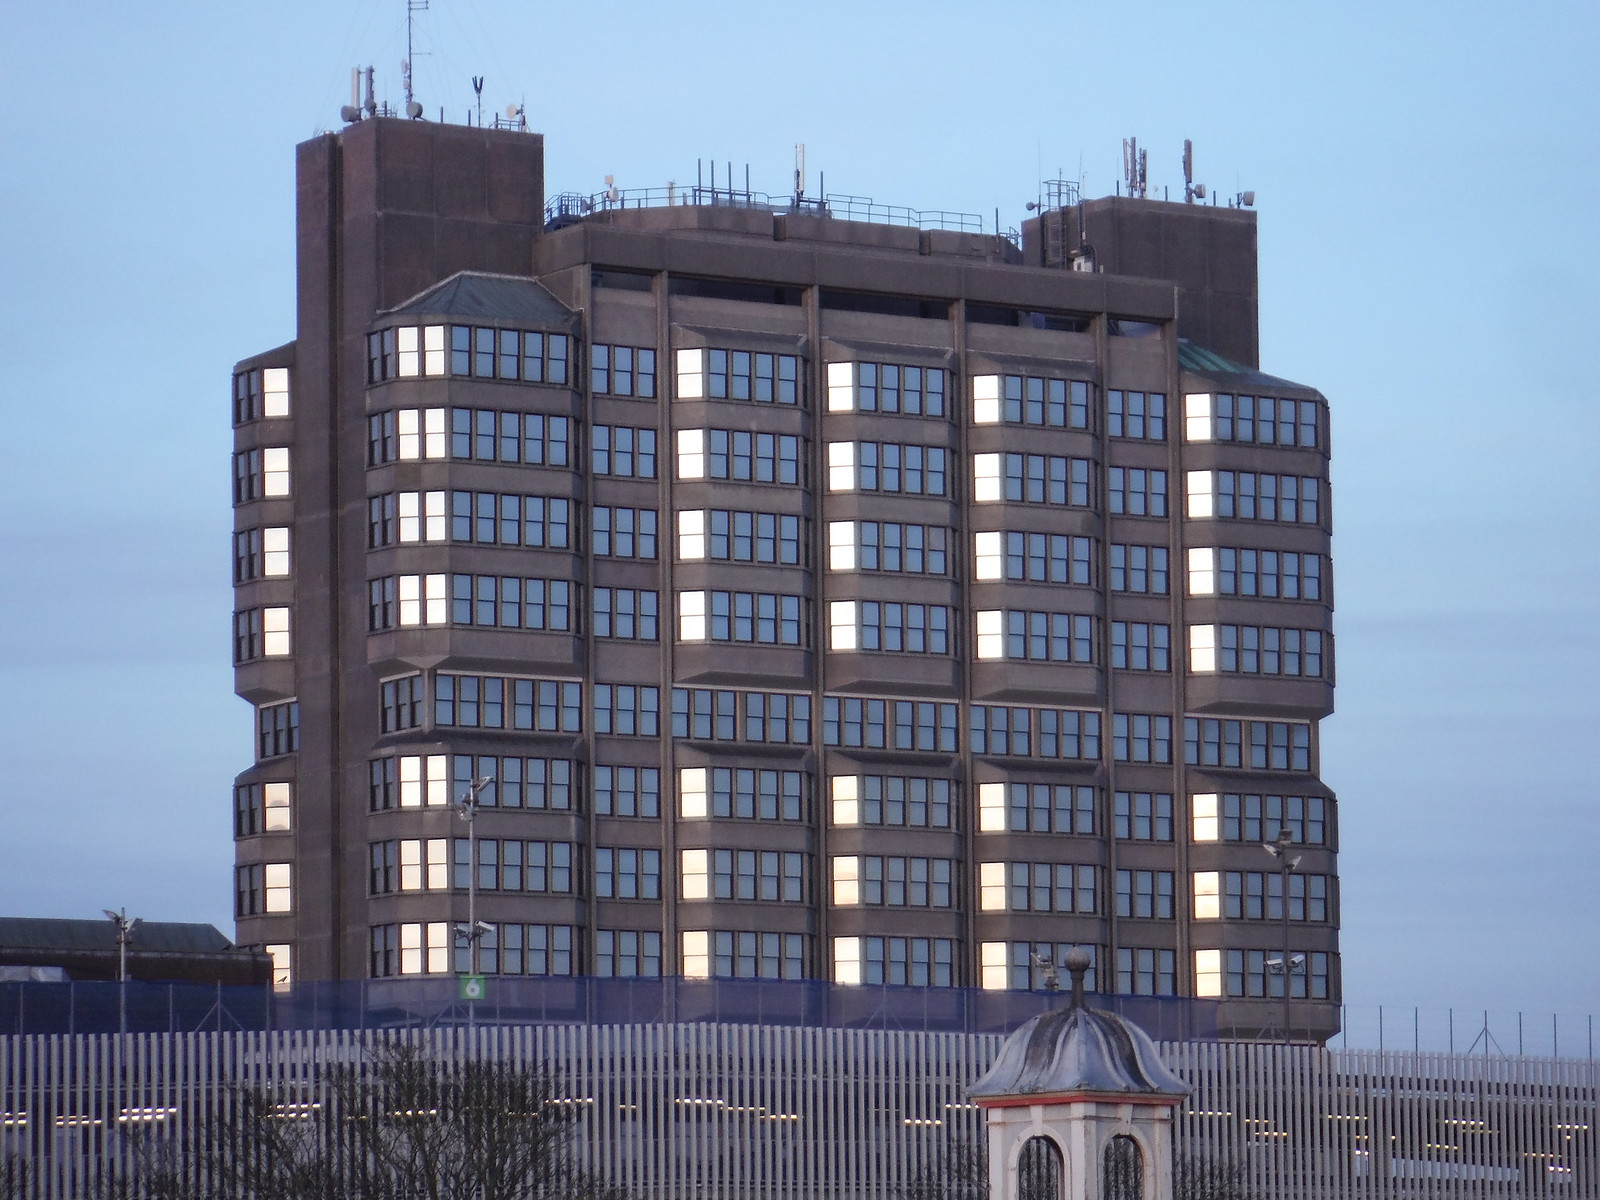 Bucks County Council Building, Aylesbury SWC Walk 193 Haddenham to Aylesbury (via Gibraltar and Ford)